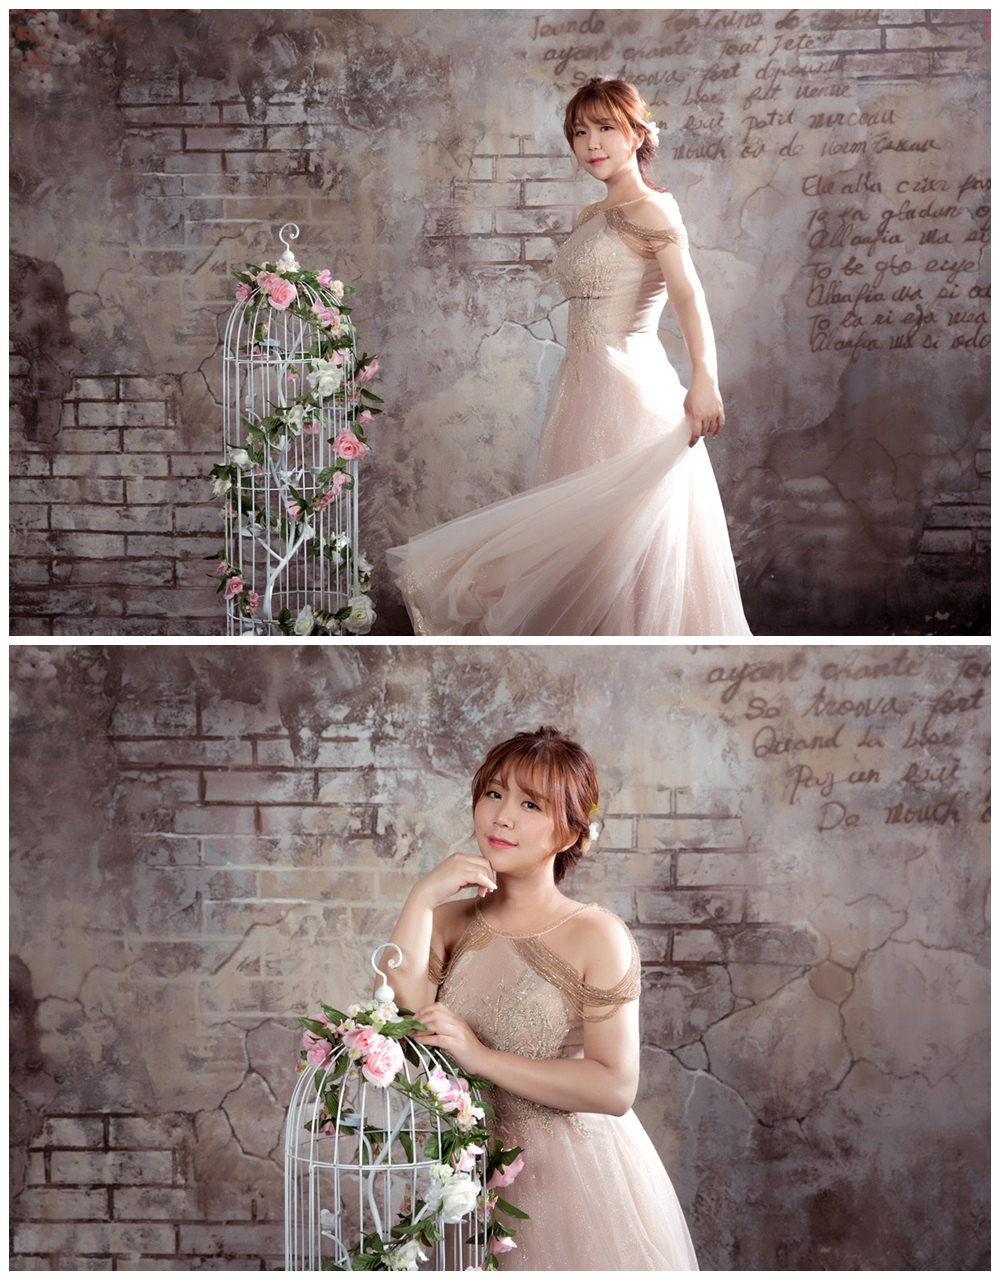 JOJO婚紗攝影-削肩晚禮服5